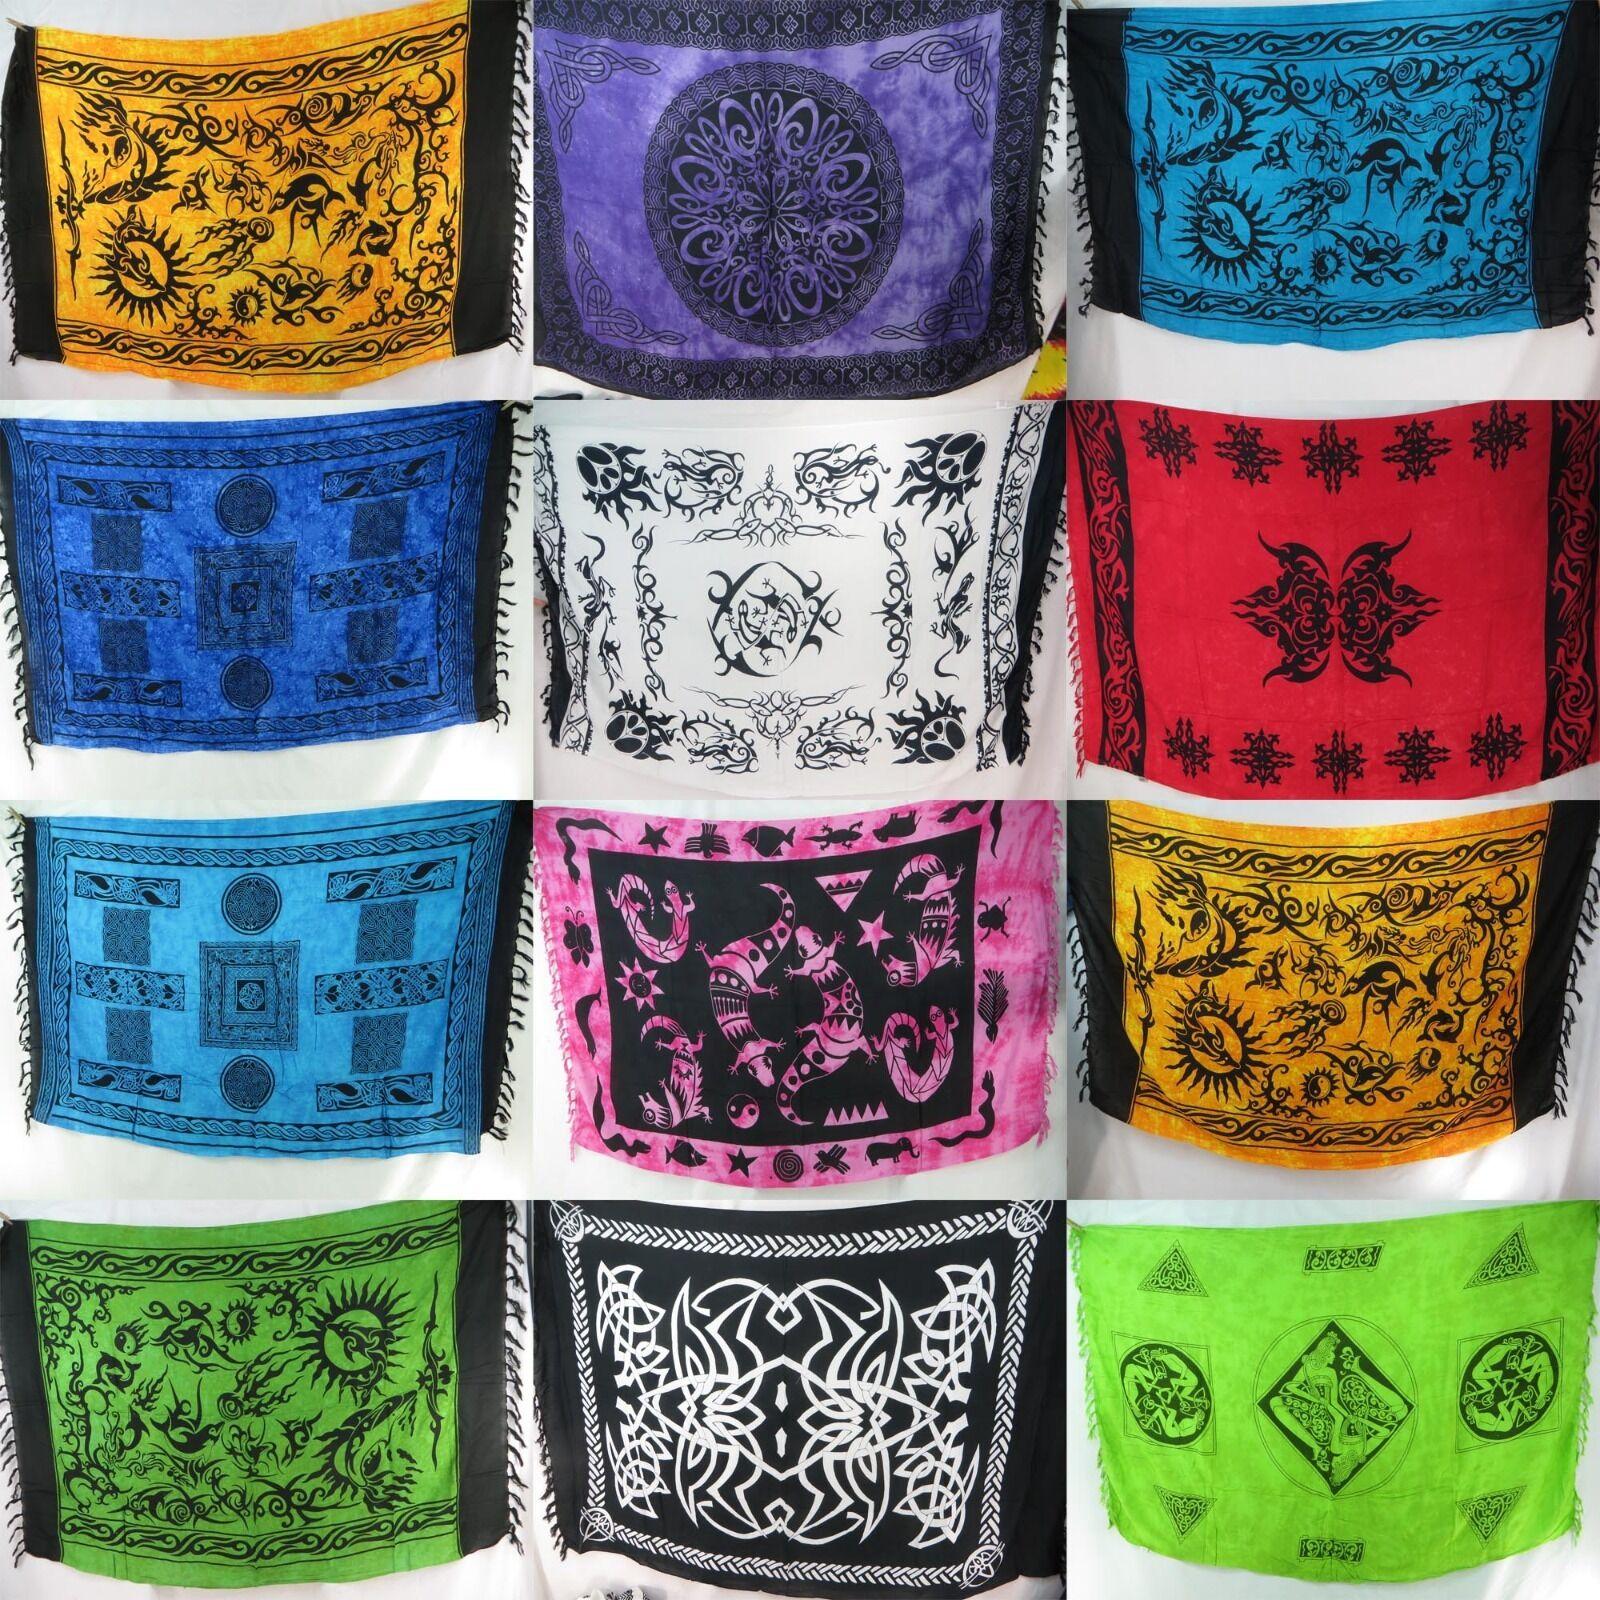 US SELLER-5pcs tribal sarong altar cloth wicca pagan wall hanging bedspread